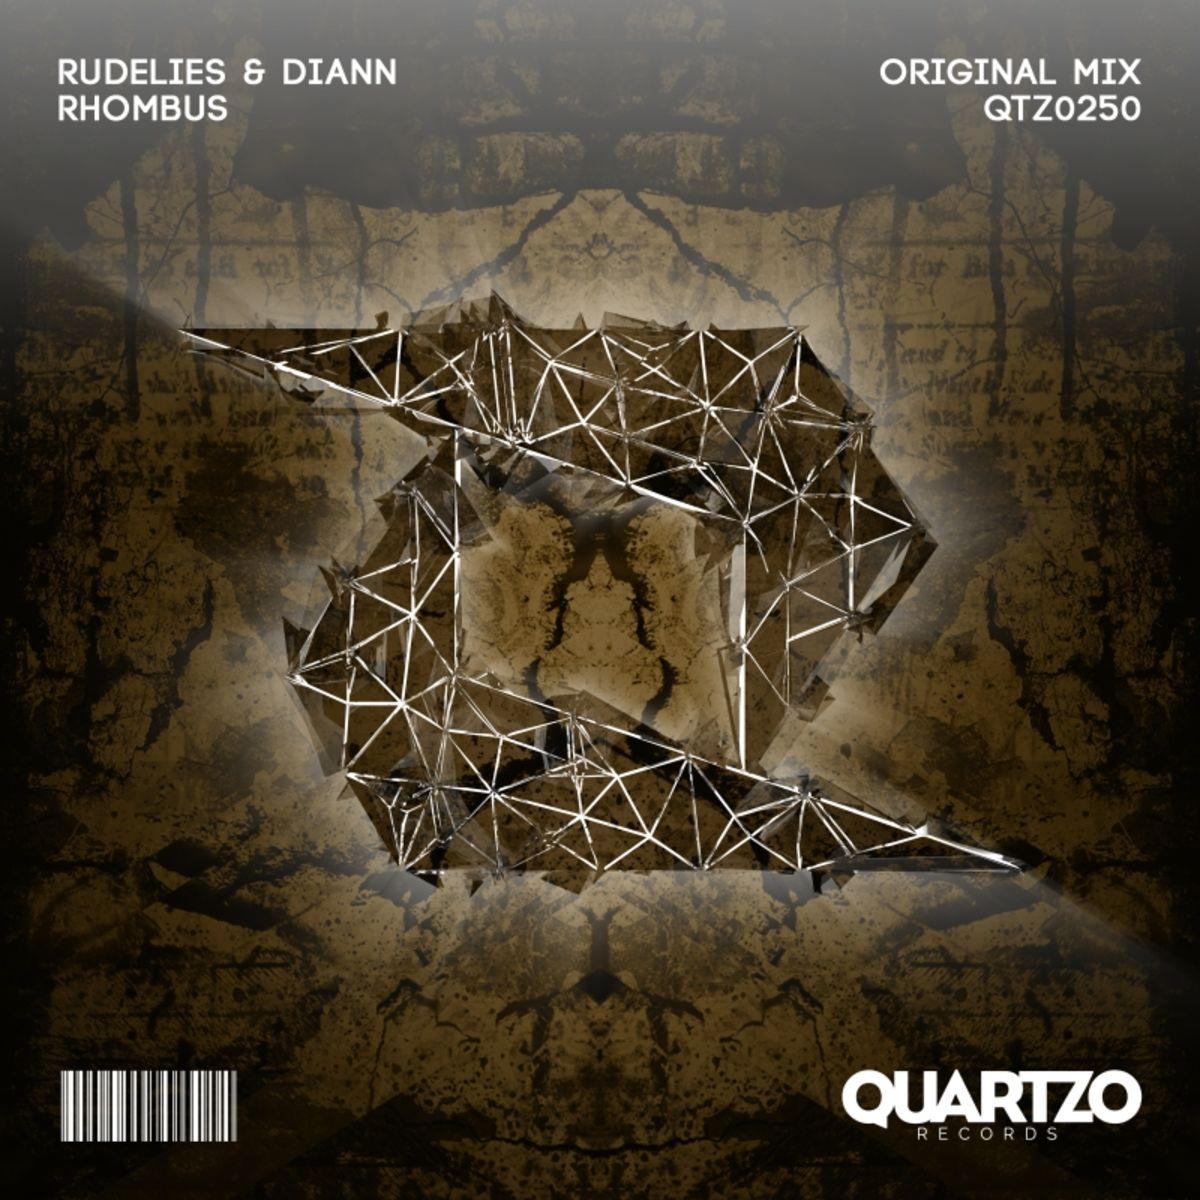 RudeLies & Diann - Rhombus  (Original Mix)